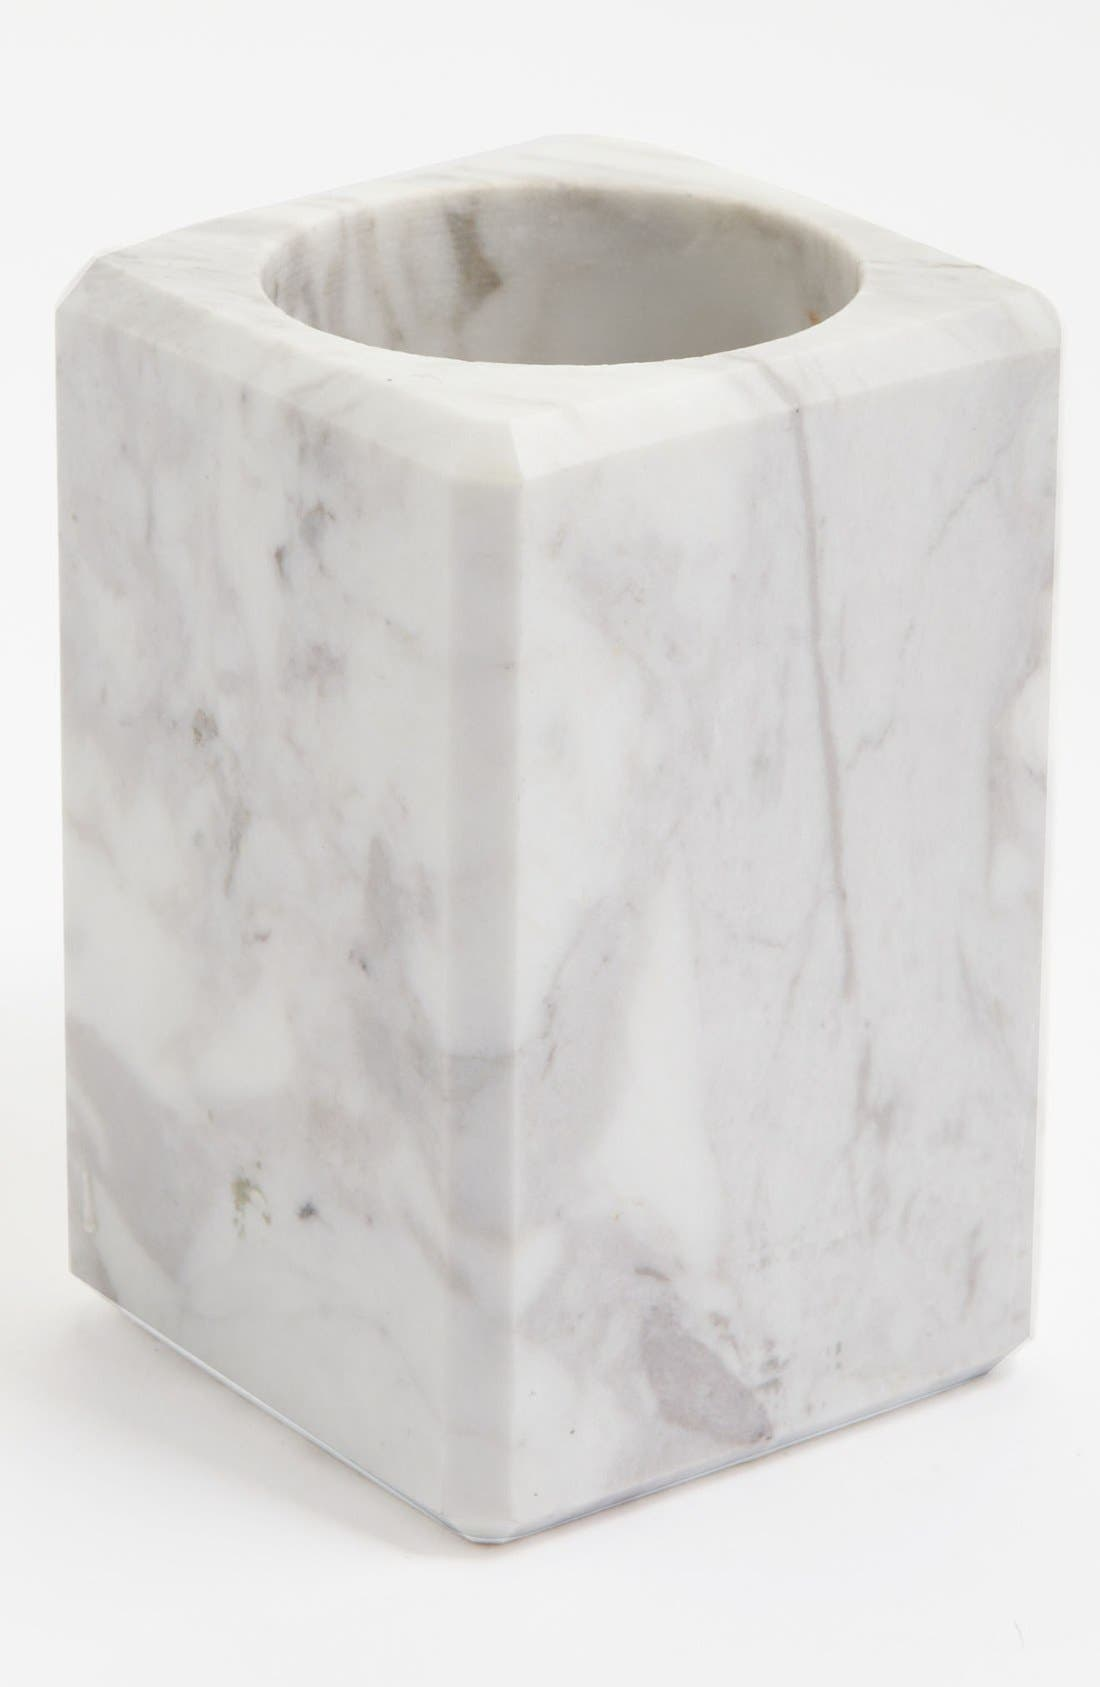 Main Image - Waterworks Studio 'Luna' White Marble Tumbler (Online Only)